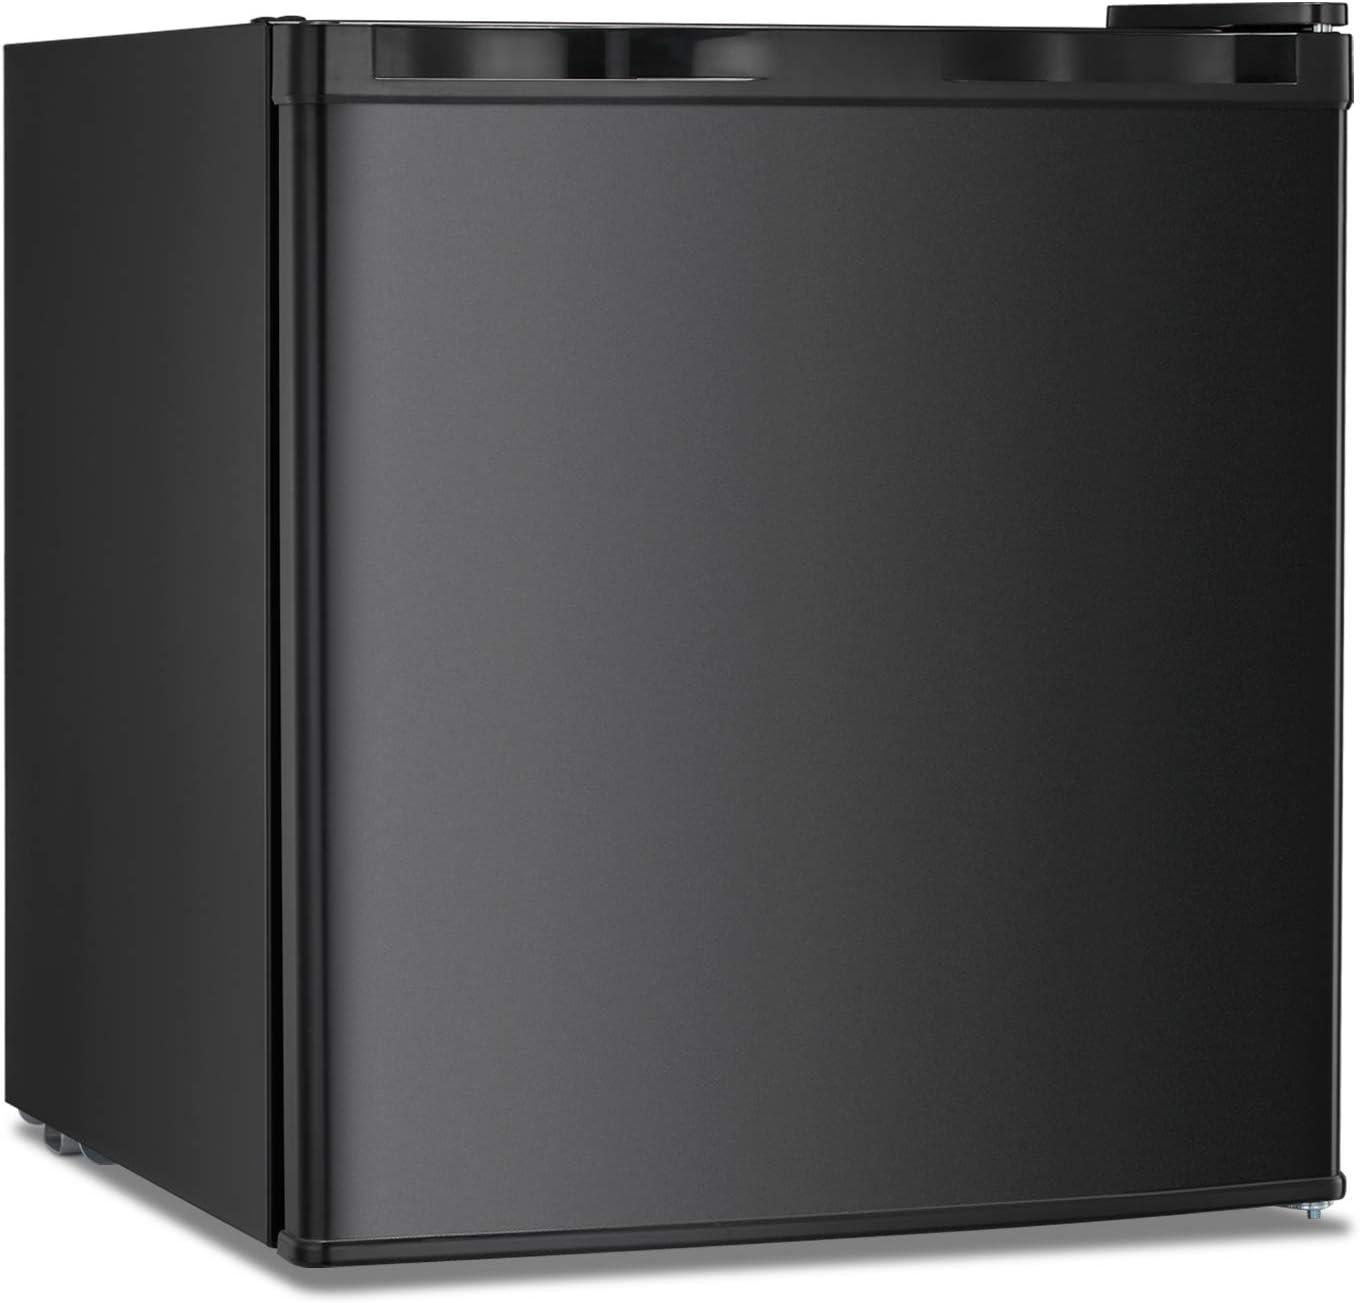 Upright Freezer Lock 1.1 Cubic Feet with Reversible Door Removable Shelves Mini Freezer Adjustable Thermostat Refrigerant for Home Office Black(Black-1.1cu.ft)